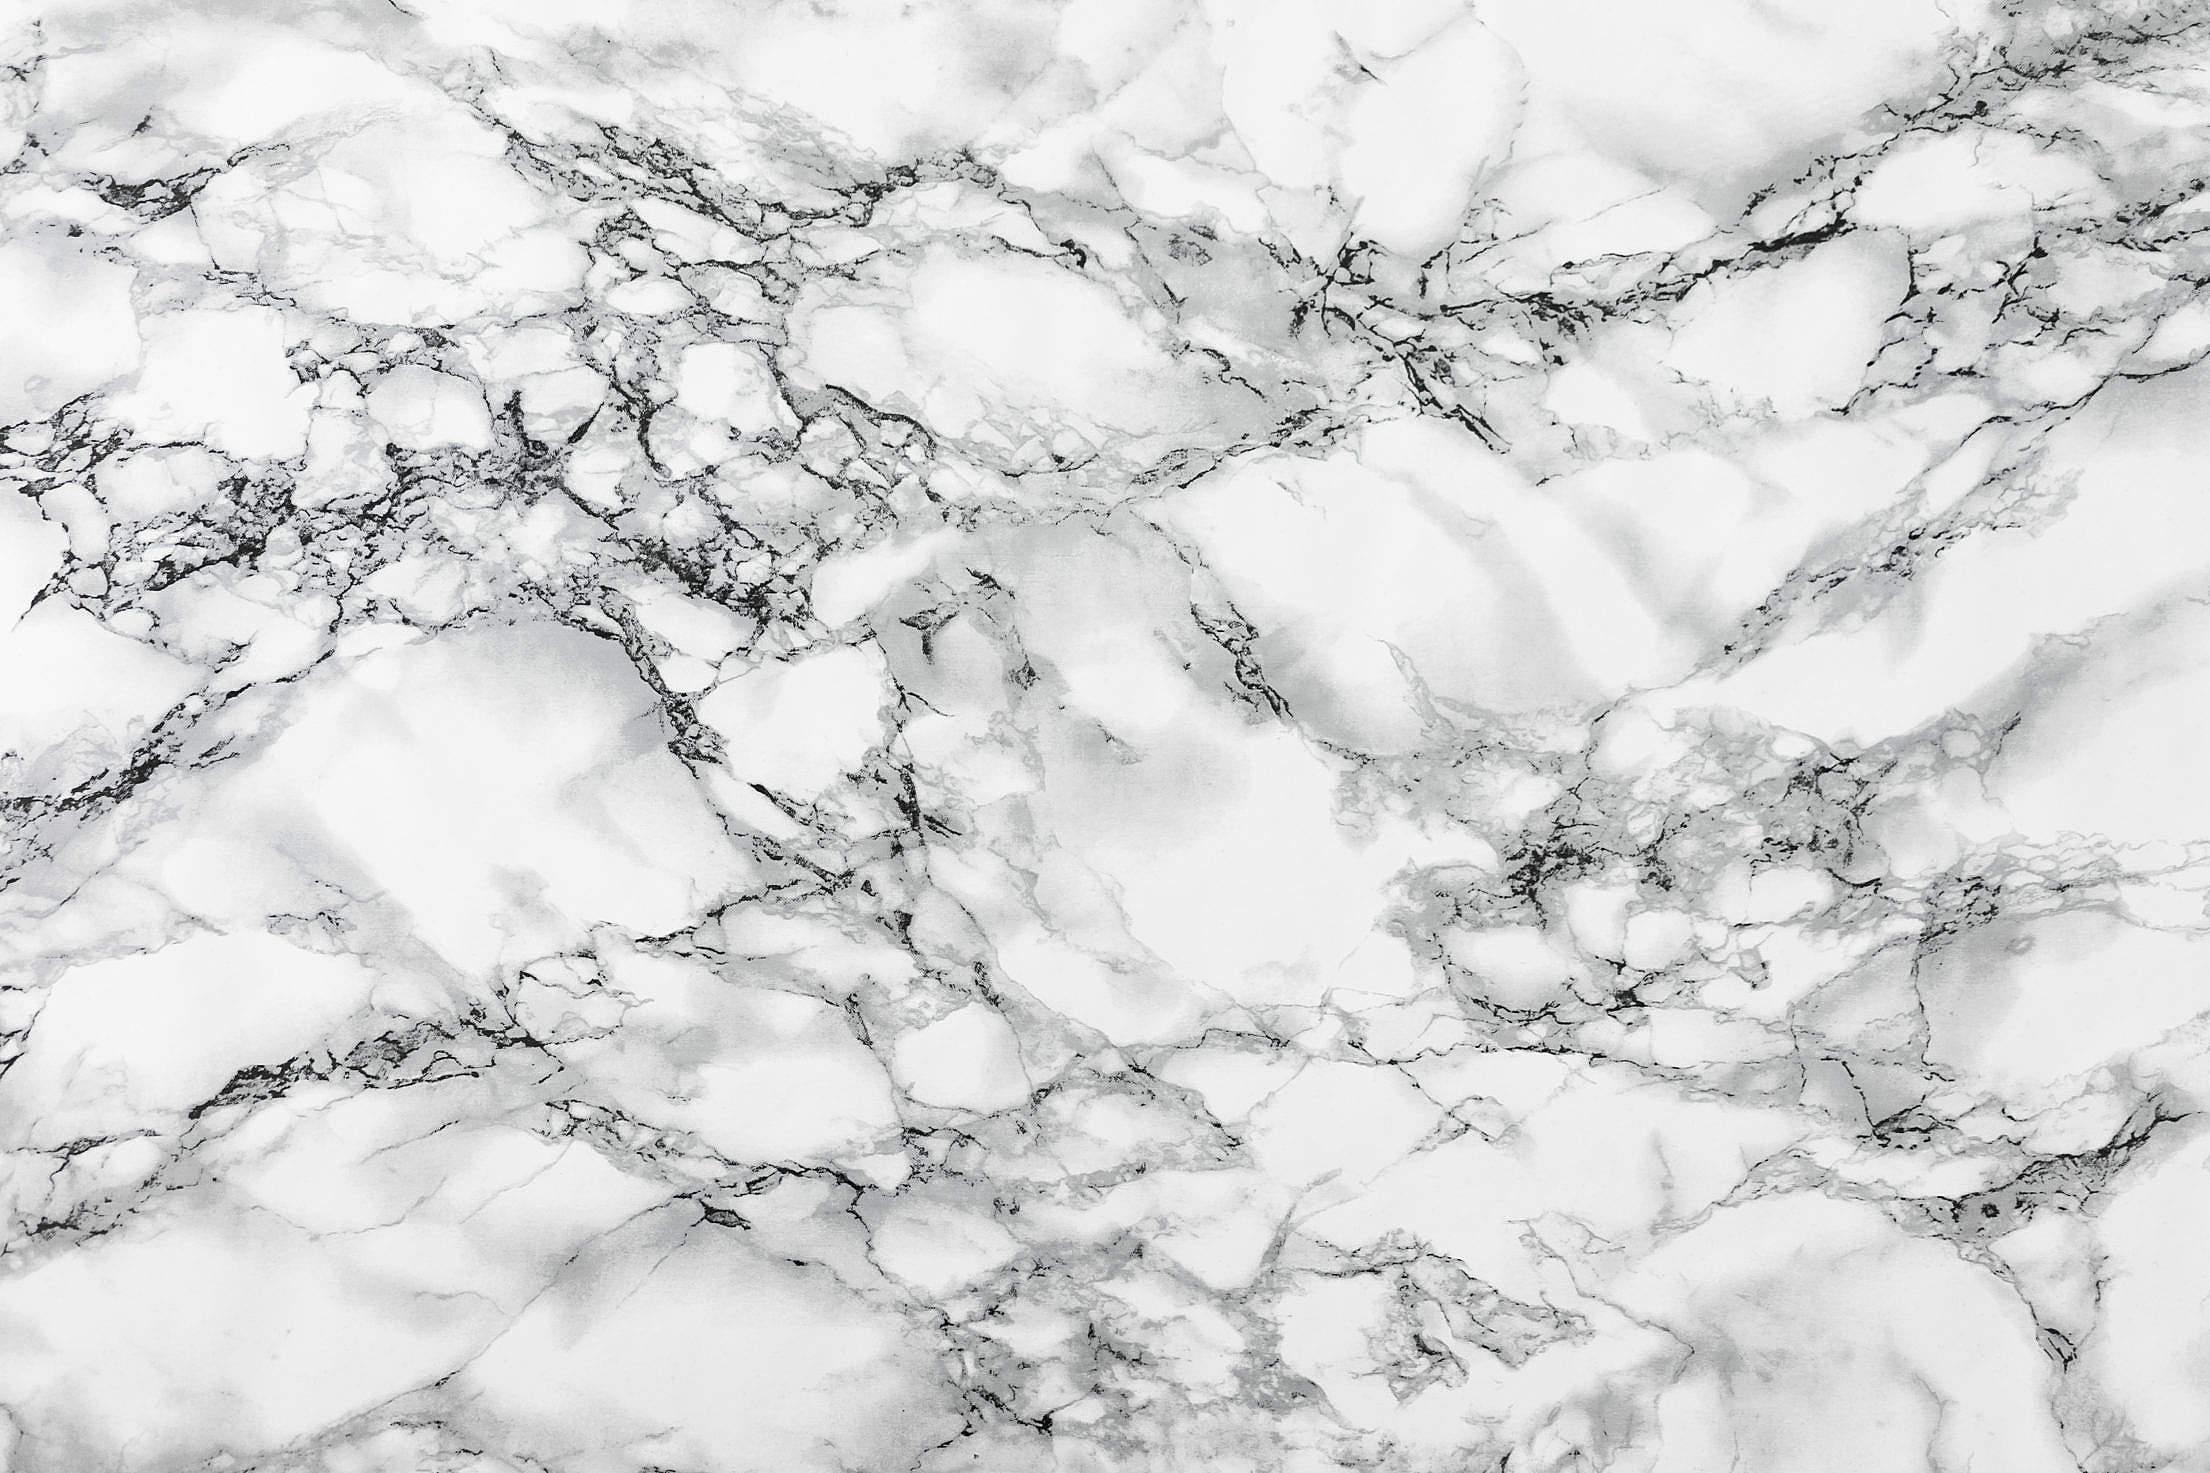 White Marble Stone Background Texture Pattern Free Stock Photo ...